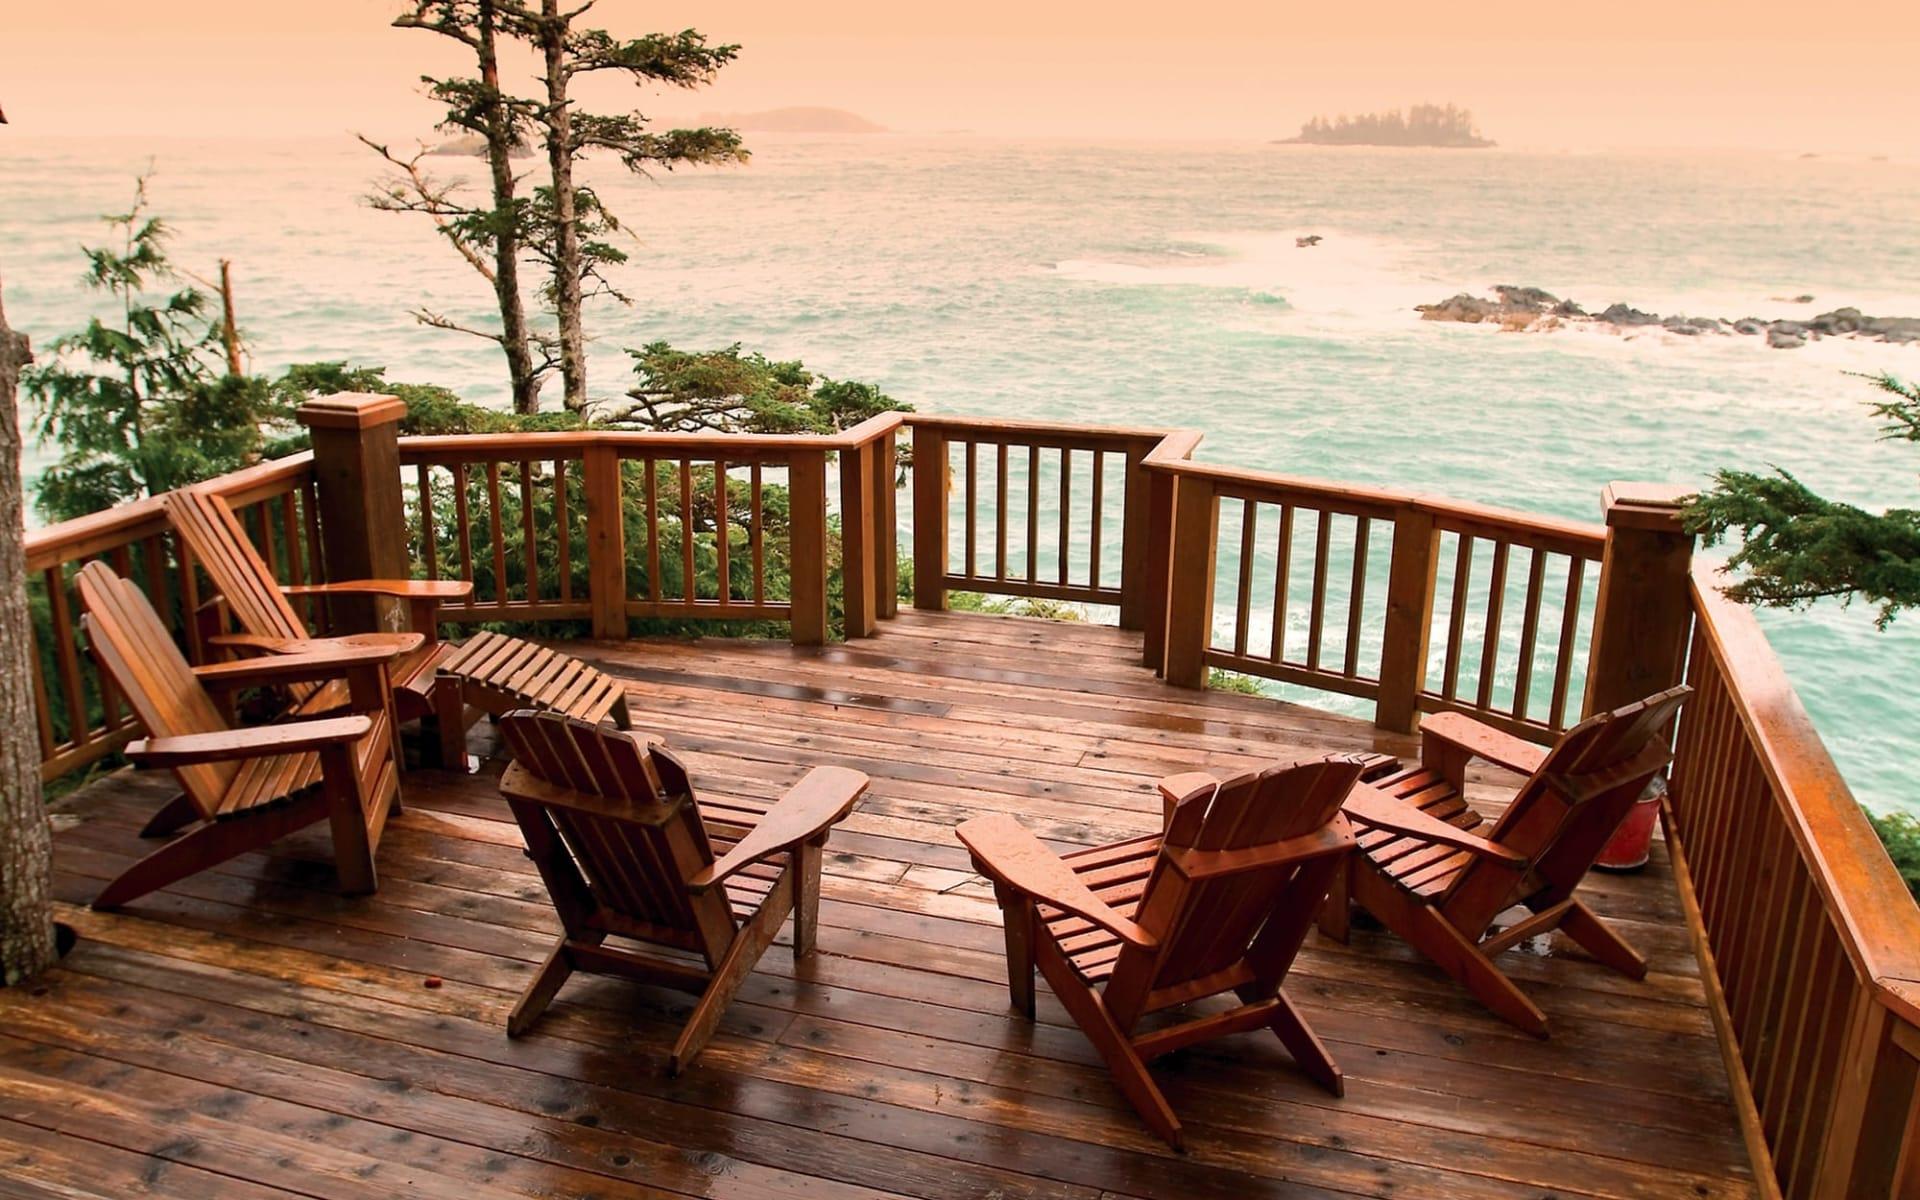 Middle Beach Lodge in Tofino: Kanada - Ausblick aufs Meer